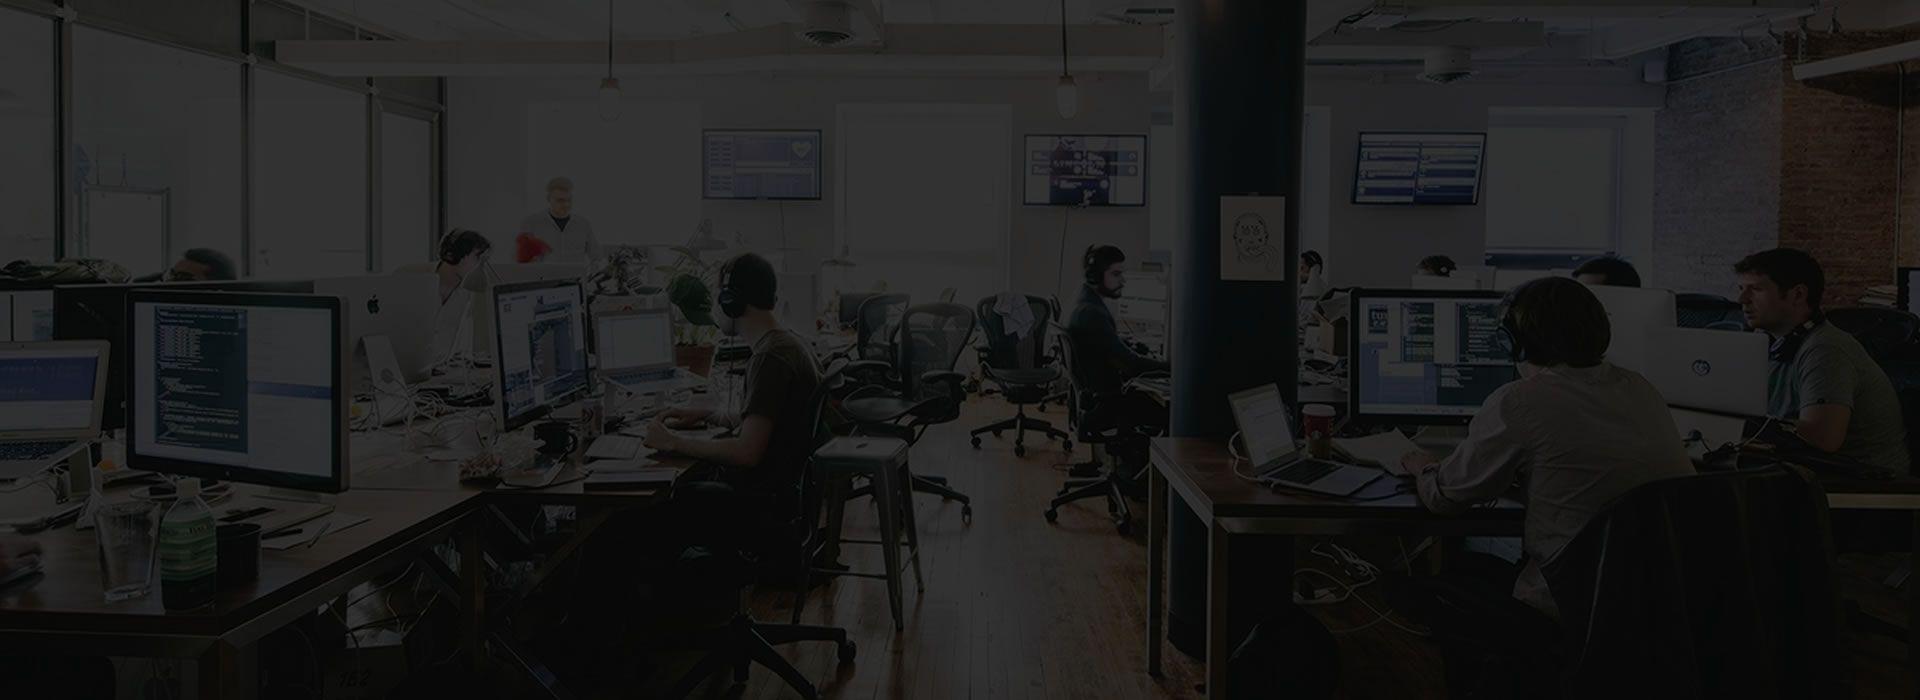 helpdesk, help desk, contas, contas pagar, contas receber, propostas, tarefas, sla, Banner